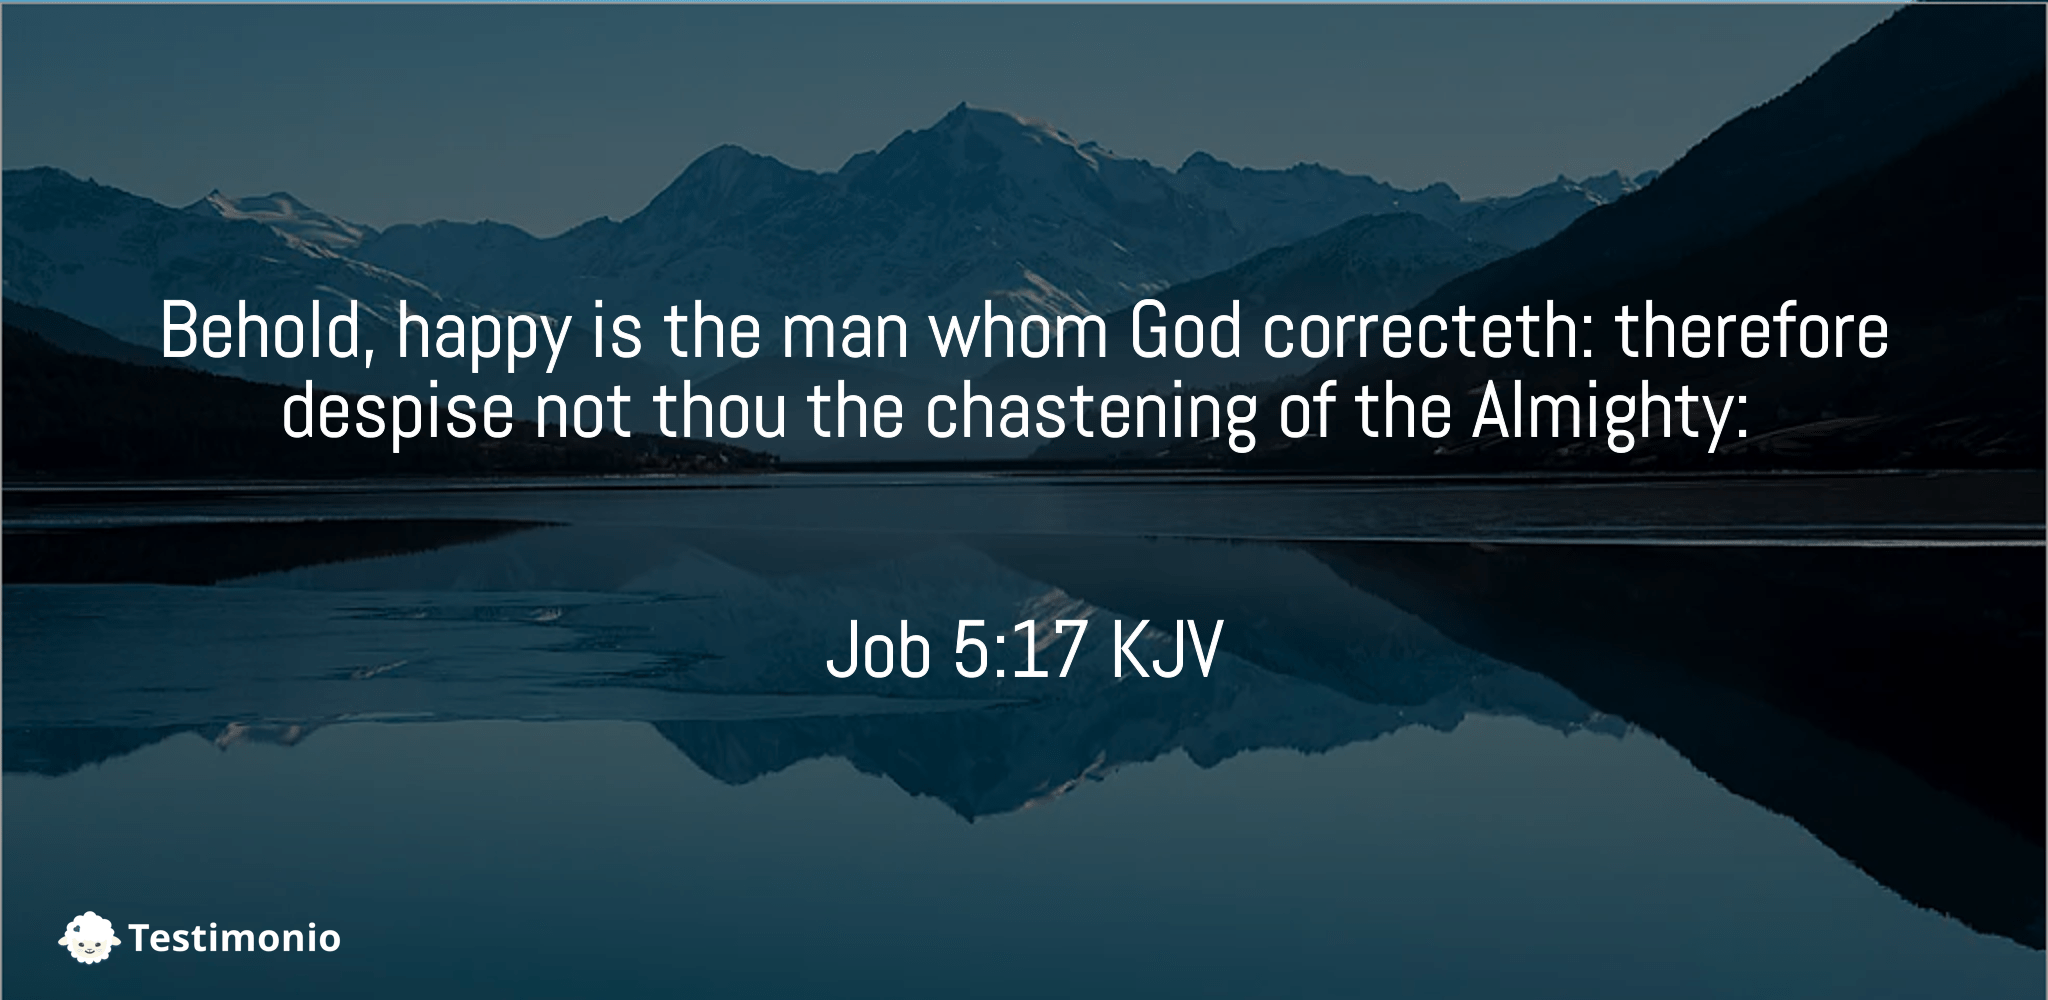 Job 5:17